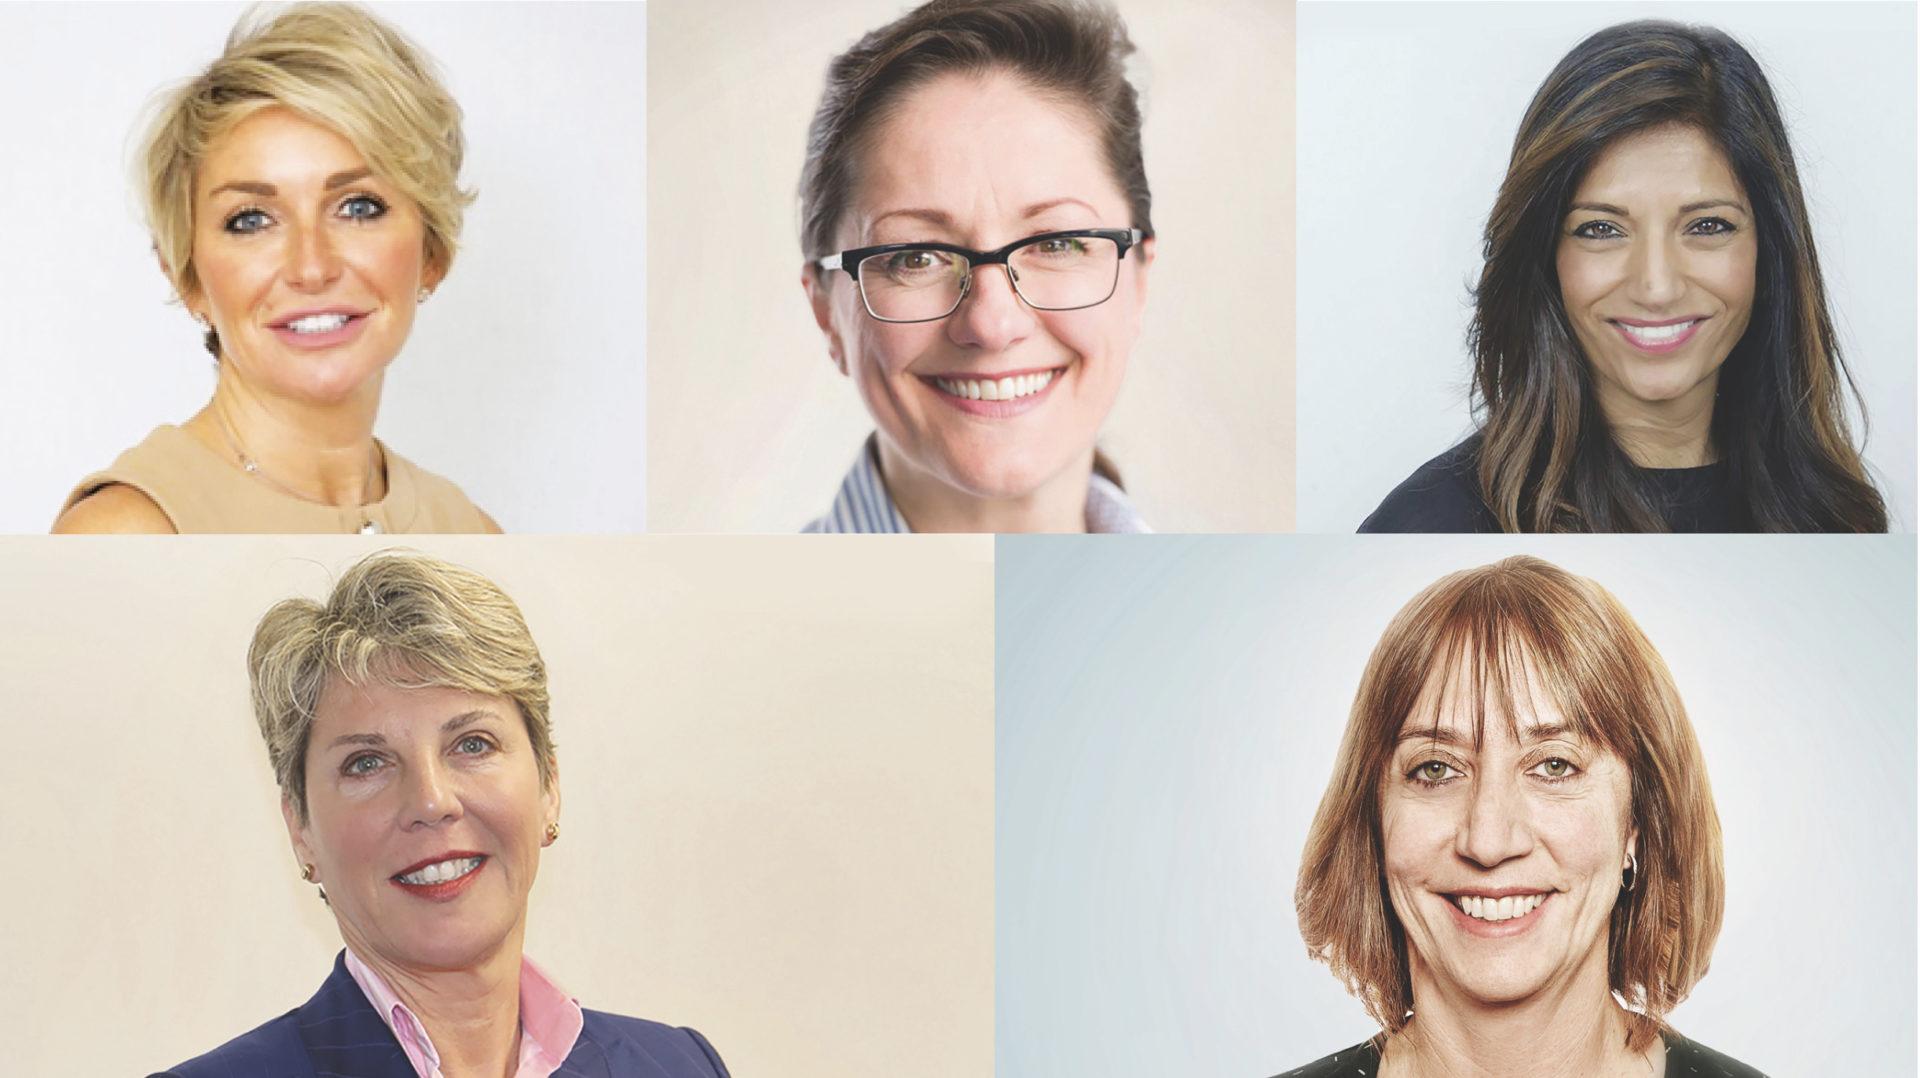 Women on the boards of major contractors include (clockwise from top left): Mandy Willis, Mace; Katy Dowding, Skanska UK; Kelly Gangotra, Skanska UK; Zoe Price, ISG (image: Solk Photography); Amanda Fisher, Amey